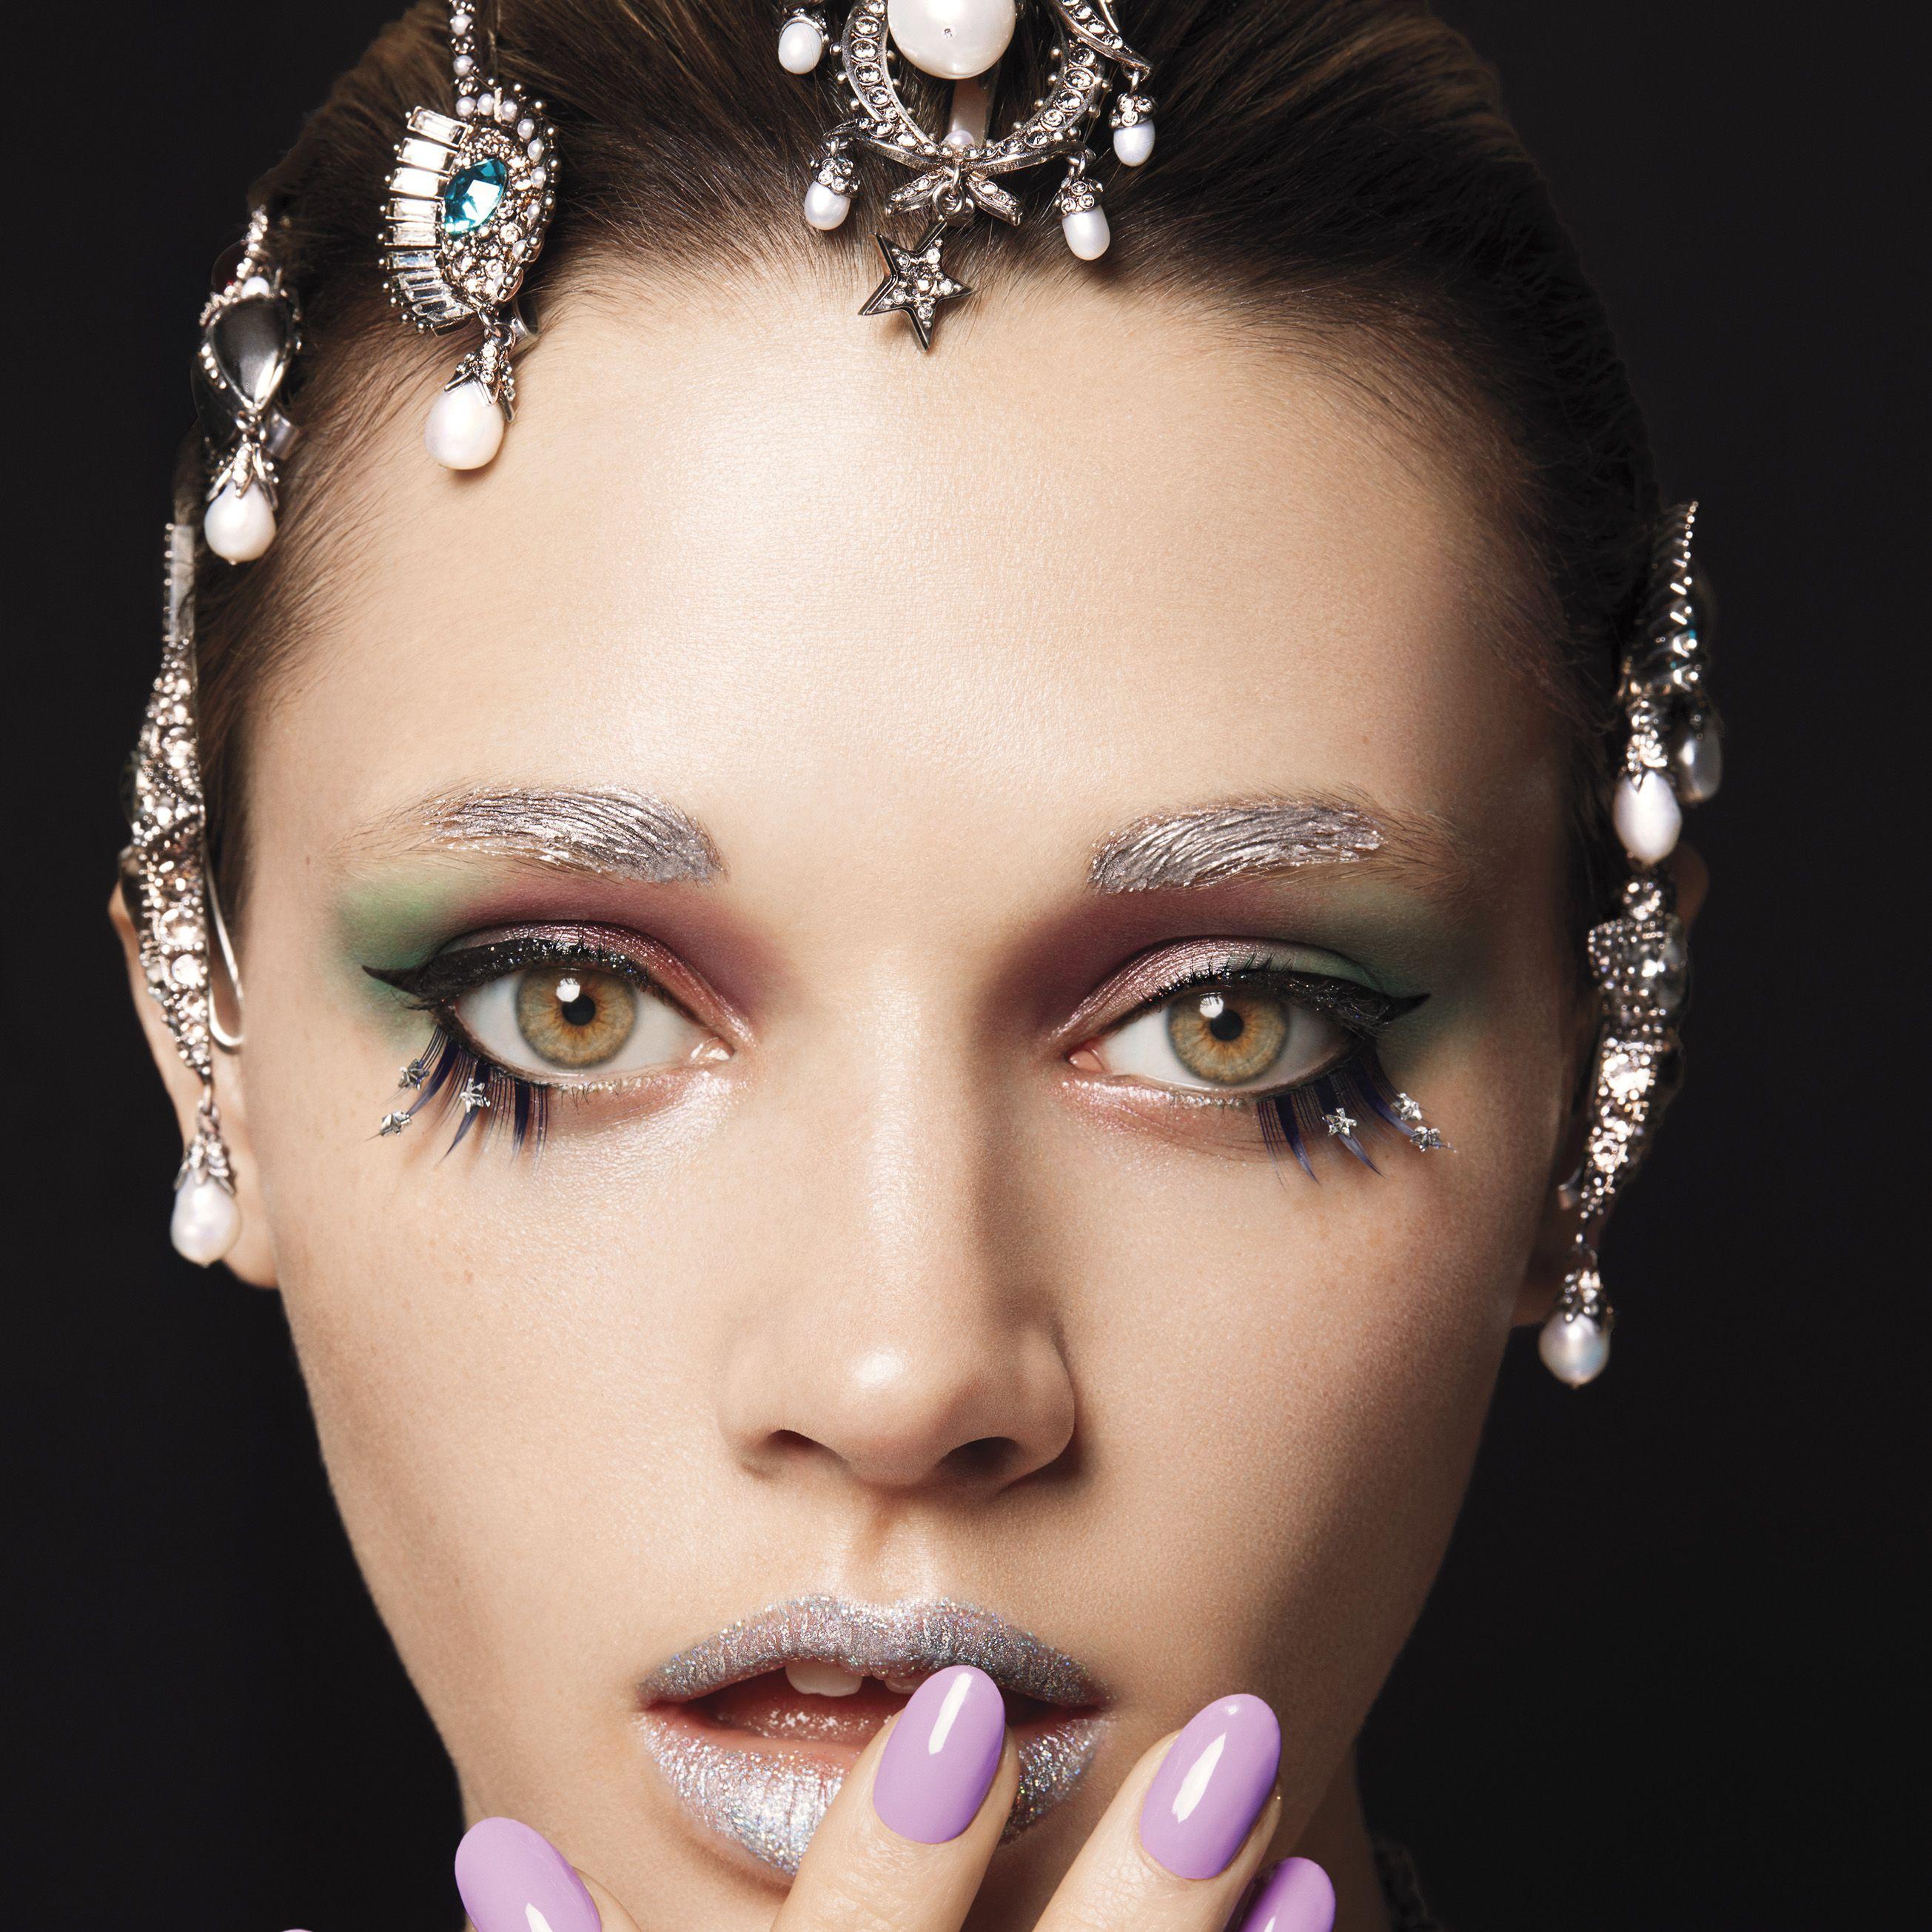 "<p><strong data-redactor-tag=""strong"" data-verified=""redactor"">BEAUTY BAZAAR </strong>Swipe on <a href=""https://www.covergirl.com/beauty-products/eye-makeup/eyeliner/flamed-out-eyeshadow-pots?&amp&#x3B;utm_source=google&amp&#x3B;utm_medium=cpc&amp&#x3B;utm_term=%2Bcovergirl%20%2Bflamed%20%2Bout%20%2Bshadow&amp&#x3B;utm_campaign=Covergirl_Search_Brand+Awareness.BMM&amp&#x3B;utm_content=s1qw8AjB4_dc%7C81303072638&amp&#x3B;gclid=Cj0KEQjw1K2_BRC0s6jtgJzB-aMBEiQA-WzDMemFcqnM9H3wLx3bkc-g-idNu2N8aPJVqfqLJrxiOrkaApbX8P8HAQ"" target=""_blank"">CoverGirl Flamed Out Shadow Pot in Blazing Purple</a> for jewel-tone lids ($5).<span class=""redactor-invisible-space"" data-verified=""redactor"" data-redactor-tag=""span"" data-redactor-class=""redactor-invisible-space""></span><br></p><p><strong data-redactor-tag=""strong"" data-verified=""redactor"">Dolce &amp&#x3B; Gabbana</strong> headband, $3,245,&nbsp&#x3B;<a href=""http://www.dolcegabbana.com/"" target=""_blank"">dolcegabbana.com</a>.</p>"